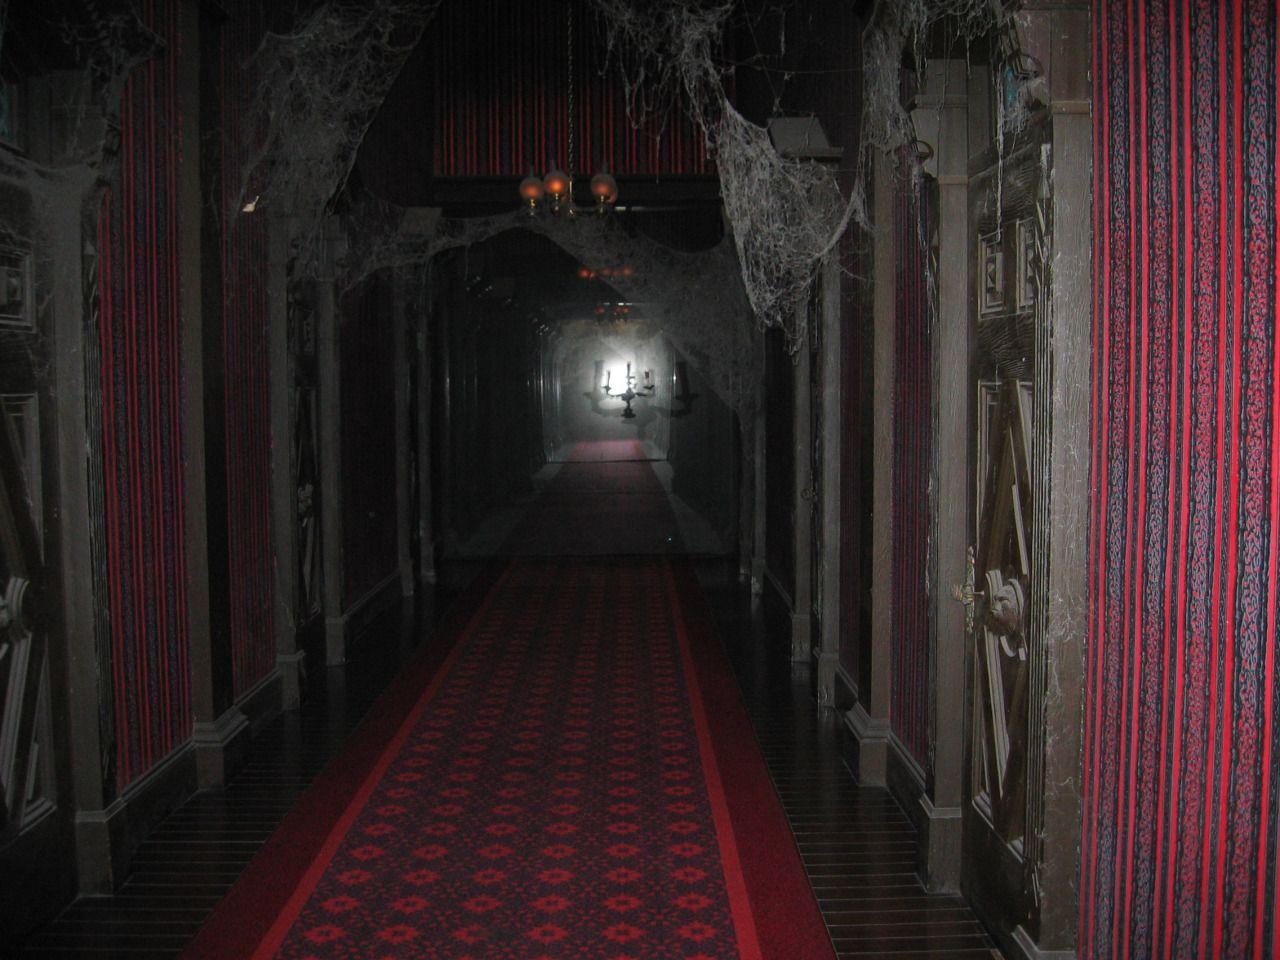 Haunted mansion backstage disneyland s endless hallway for Haunted house hallway ideas